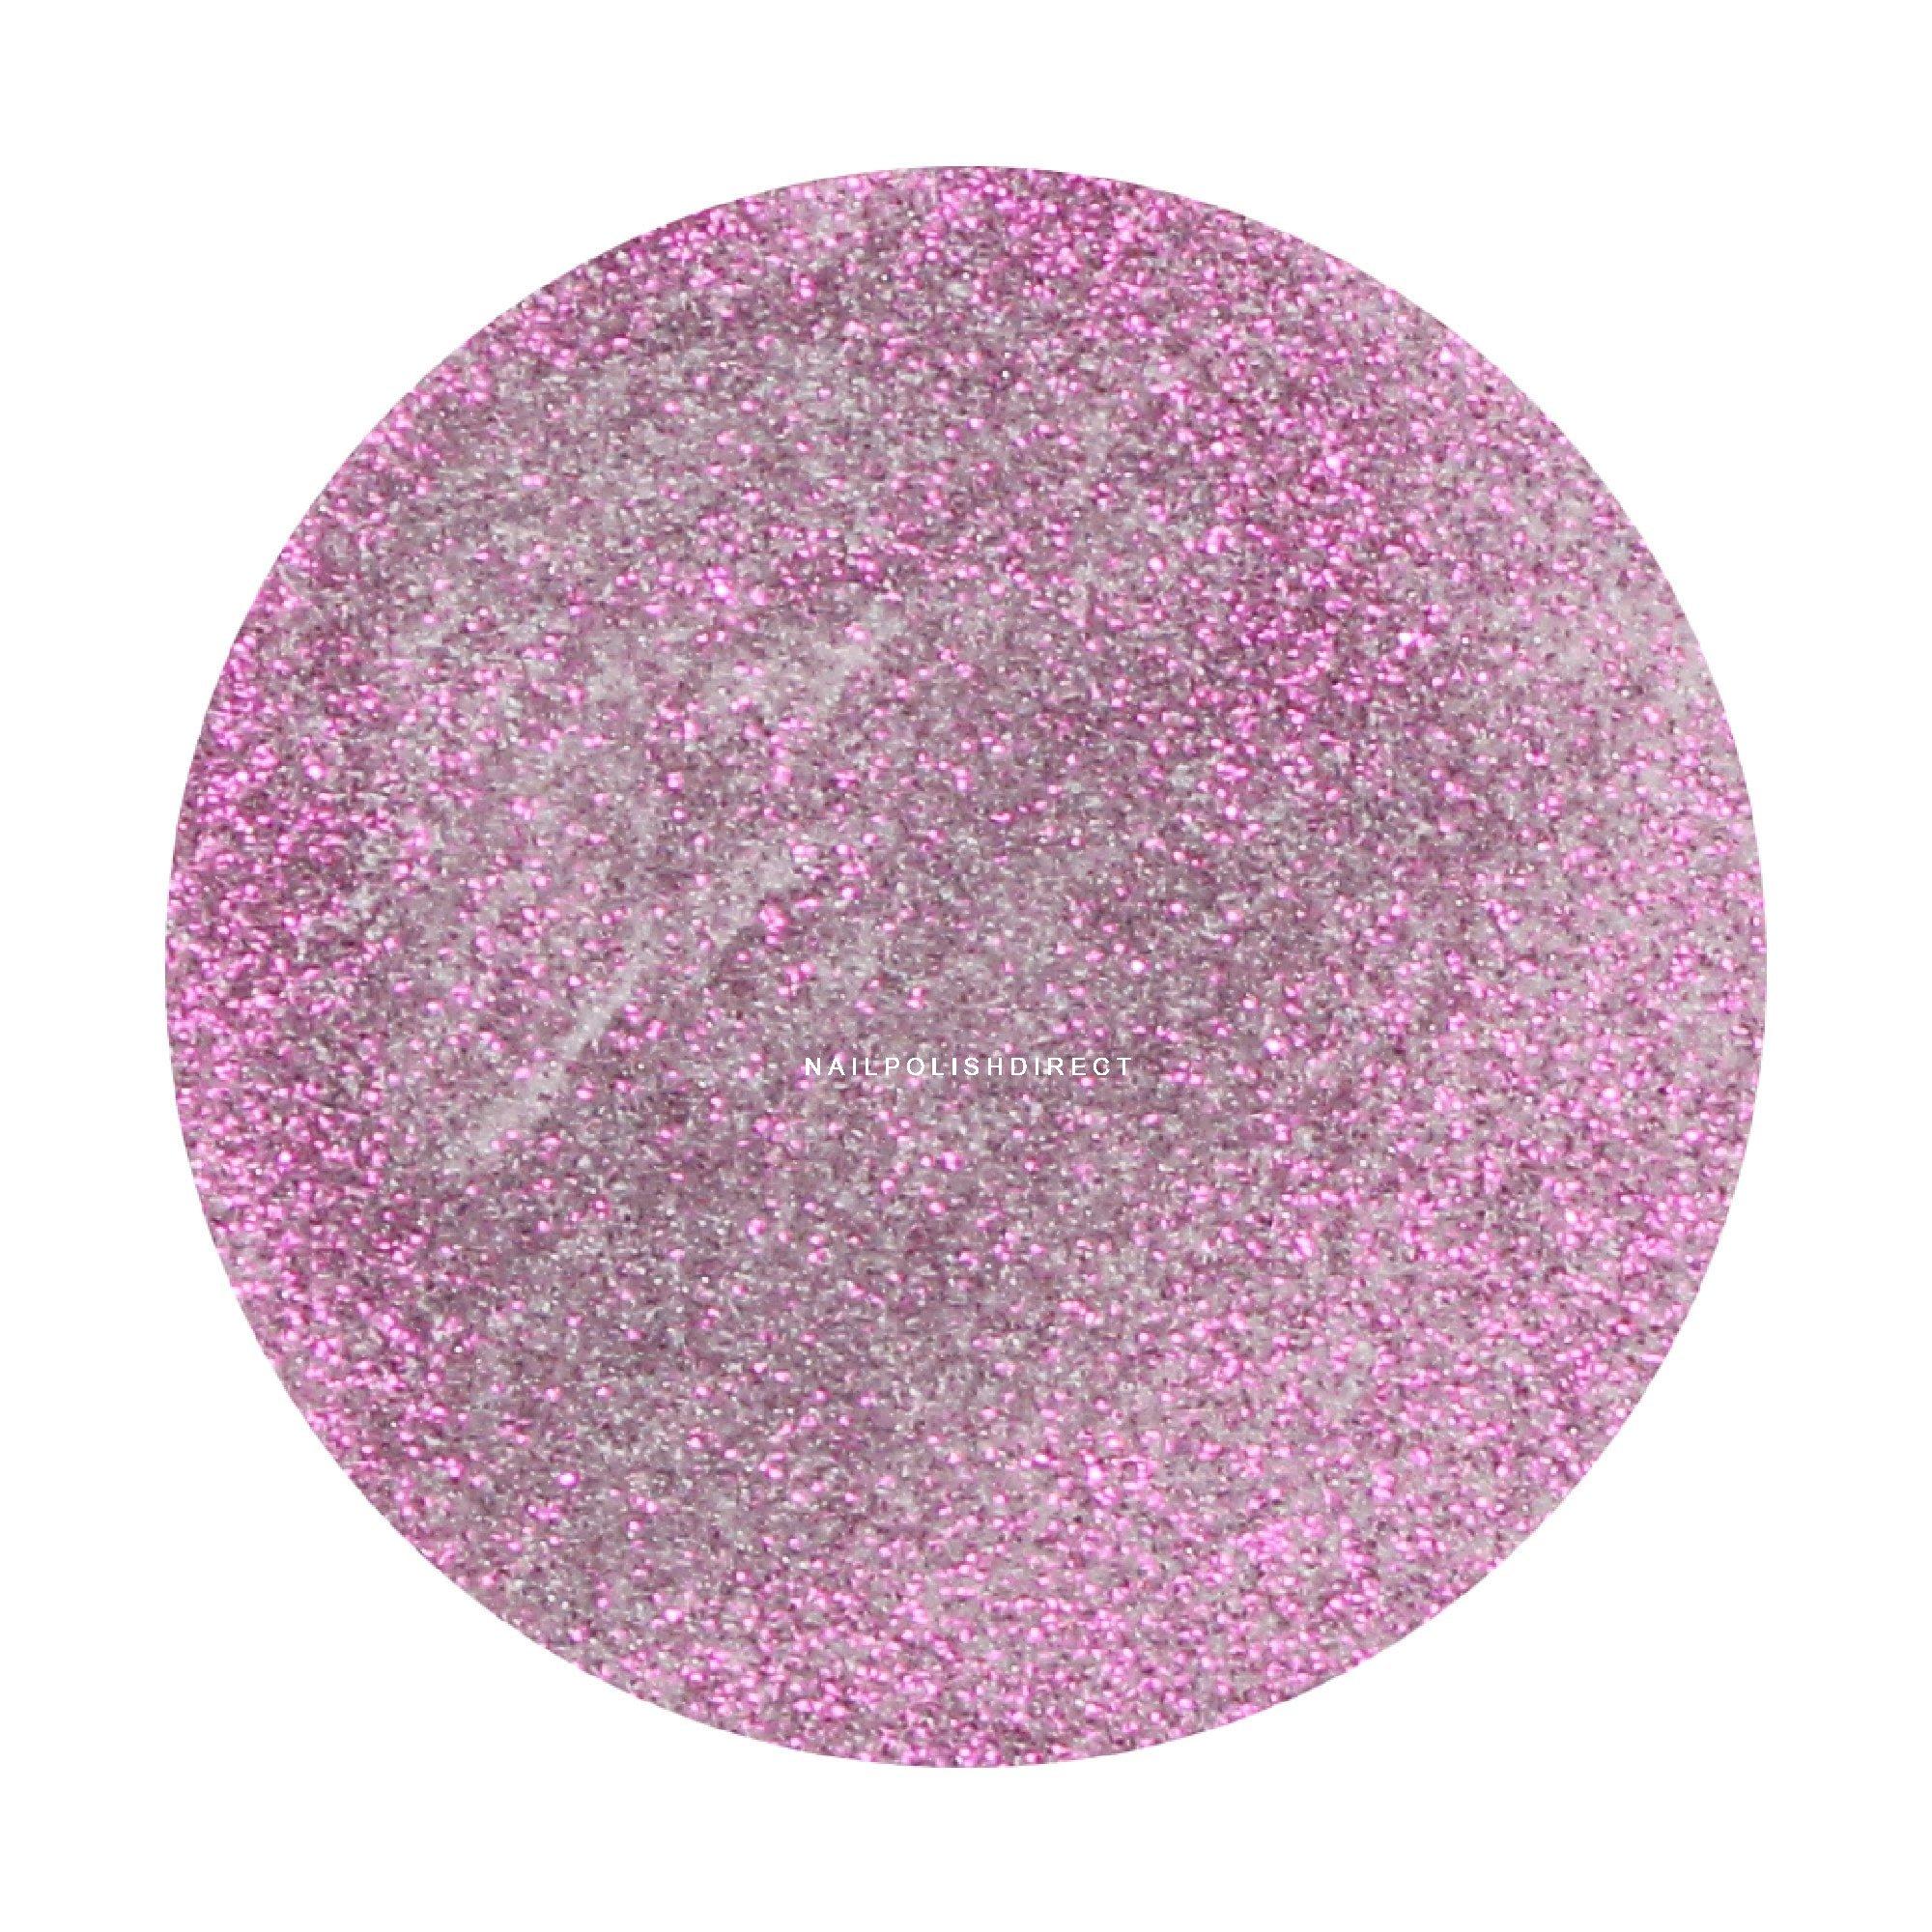 Cuccio Pro Powder Polish Dip System - Fuchsia Pink Glitter 45g (5564)